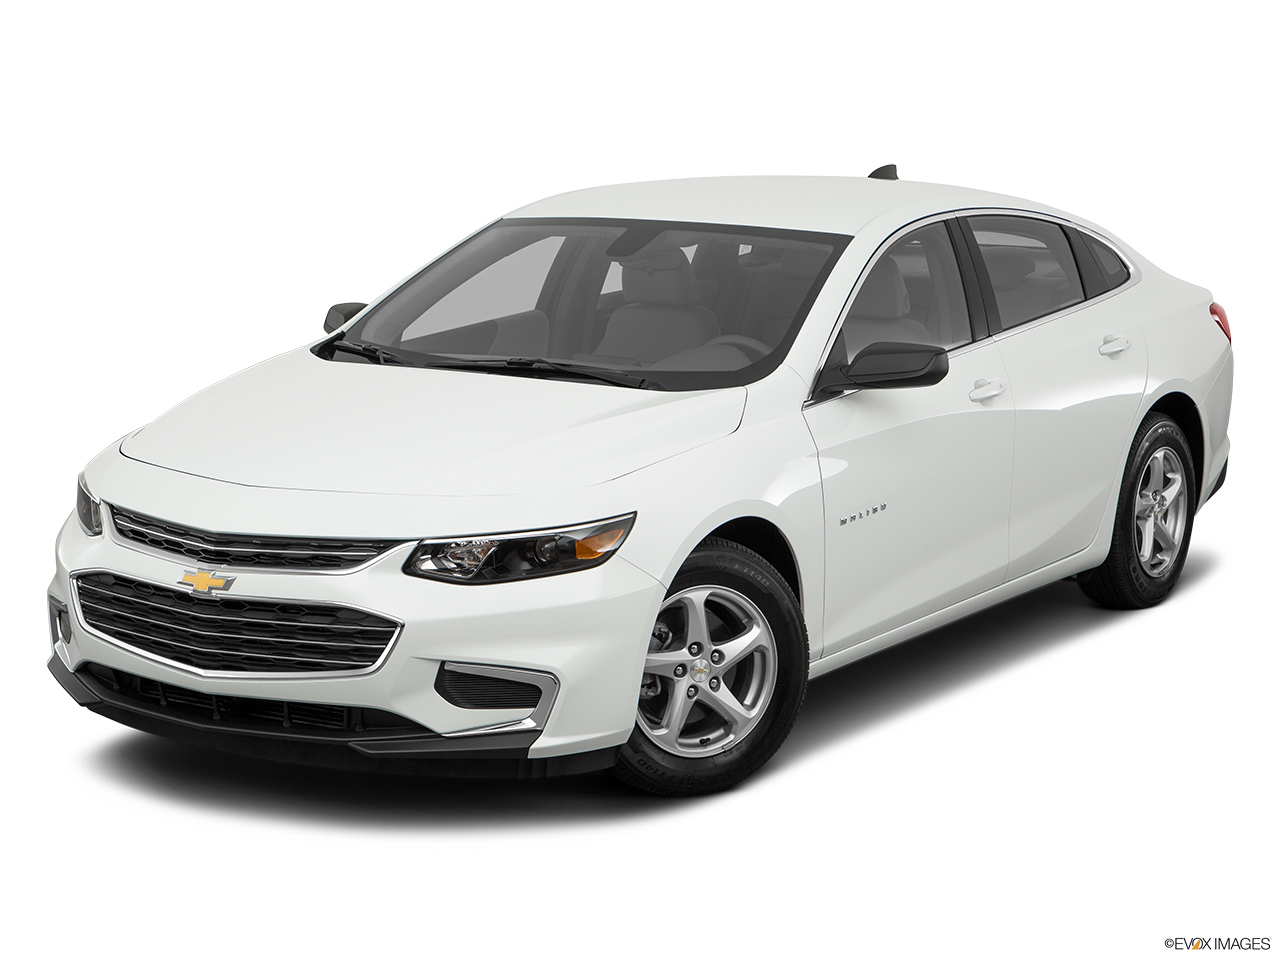 chevrolet traverse fuel tank capacity 2018 cars reviews autos post. Black Bedroom Furniture Sets. Home Design Ideas